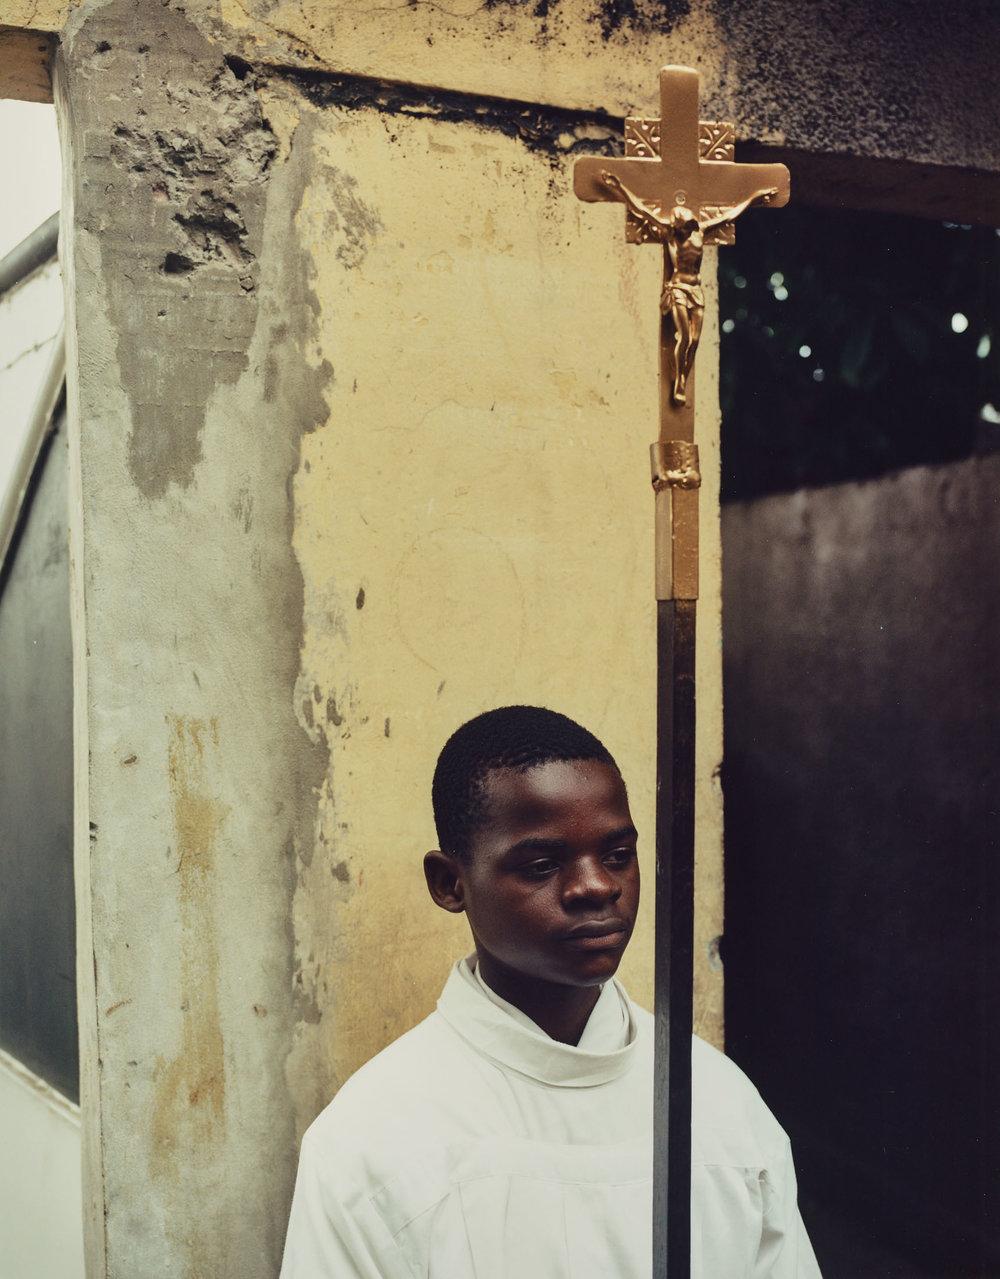 Muzina di Tata, E di Mwana   A young acolyte holds the cross of St. Dominique before Sunday service.